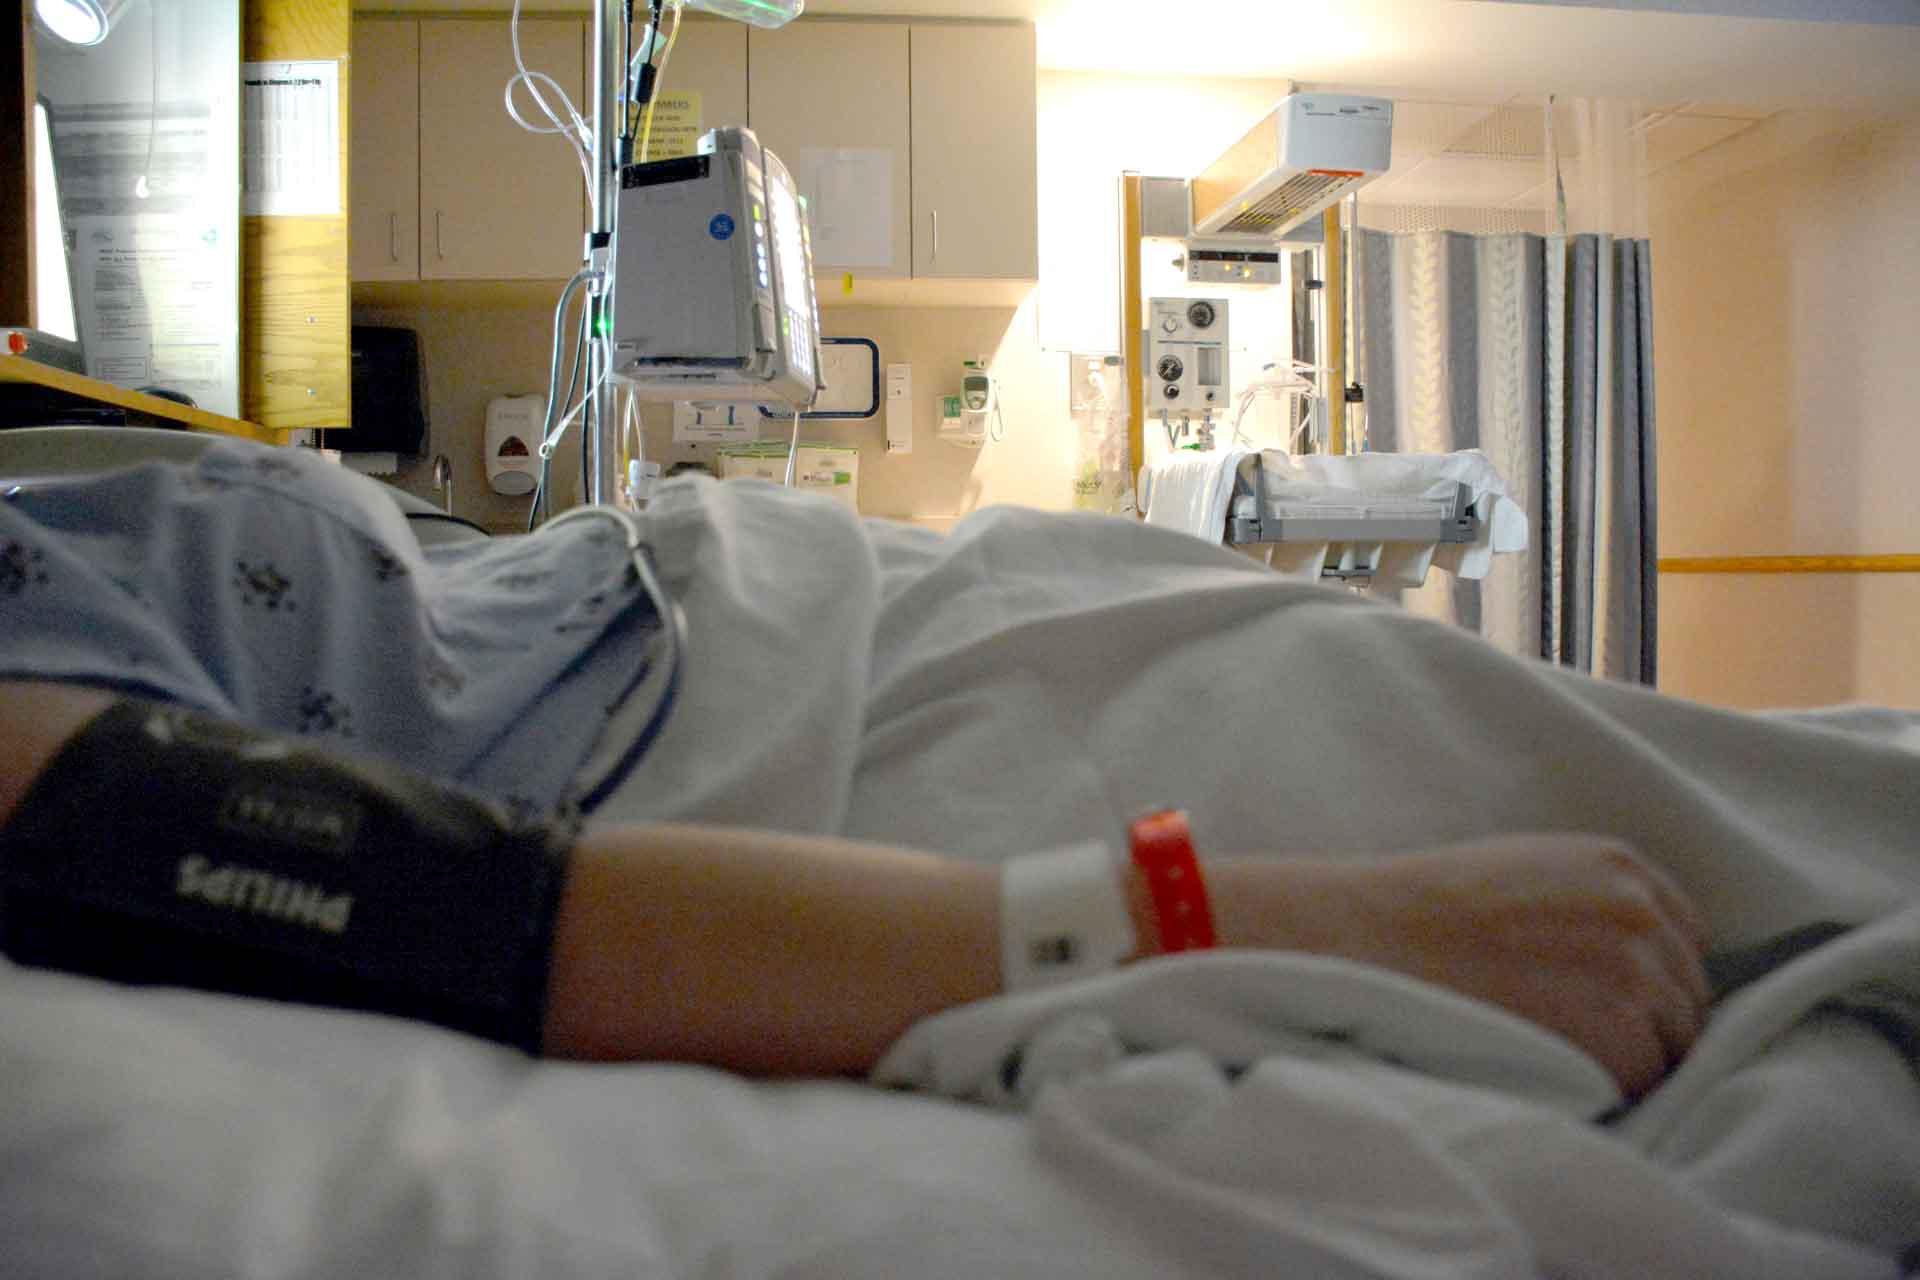 image of injury victim